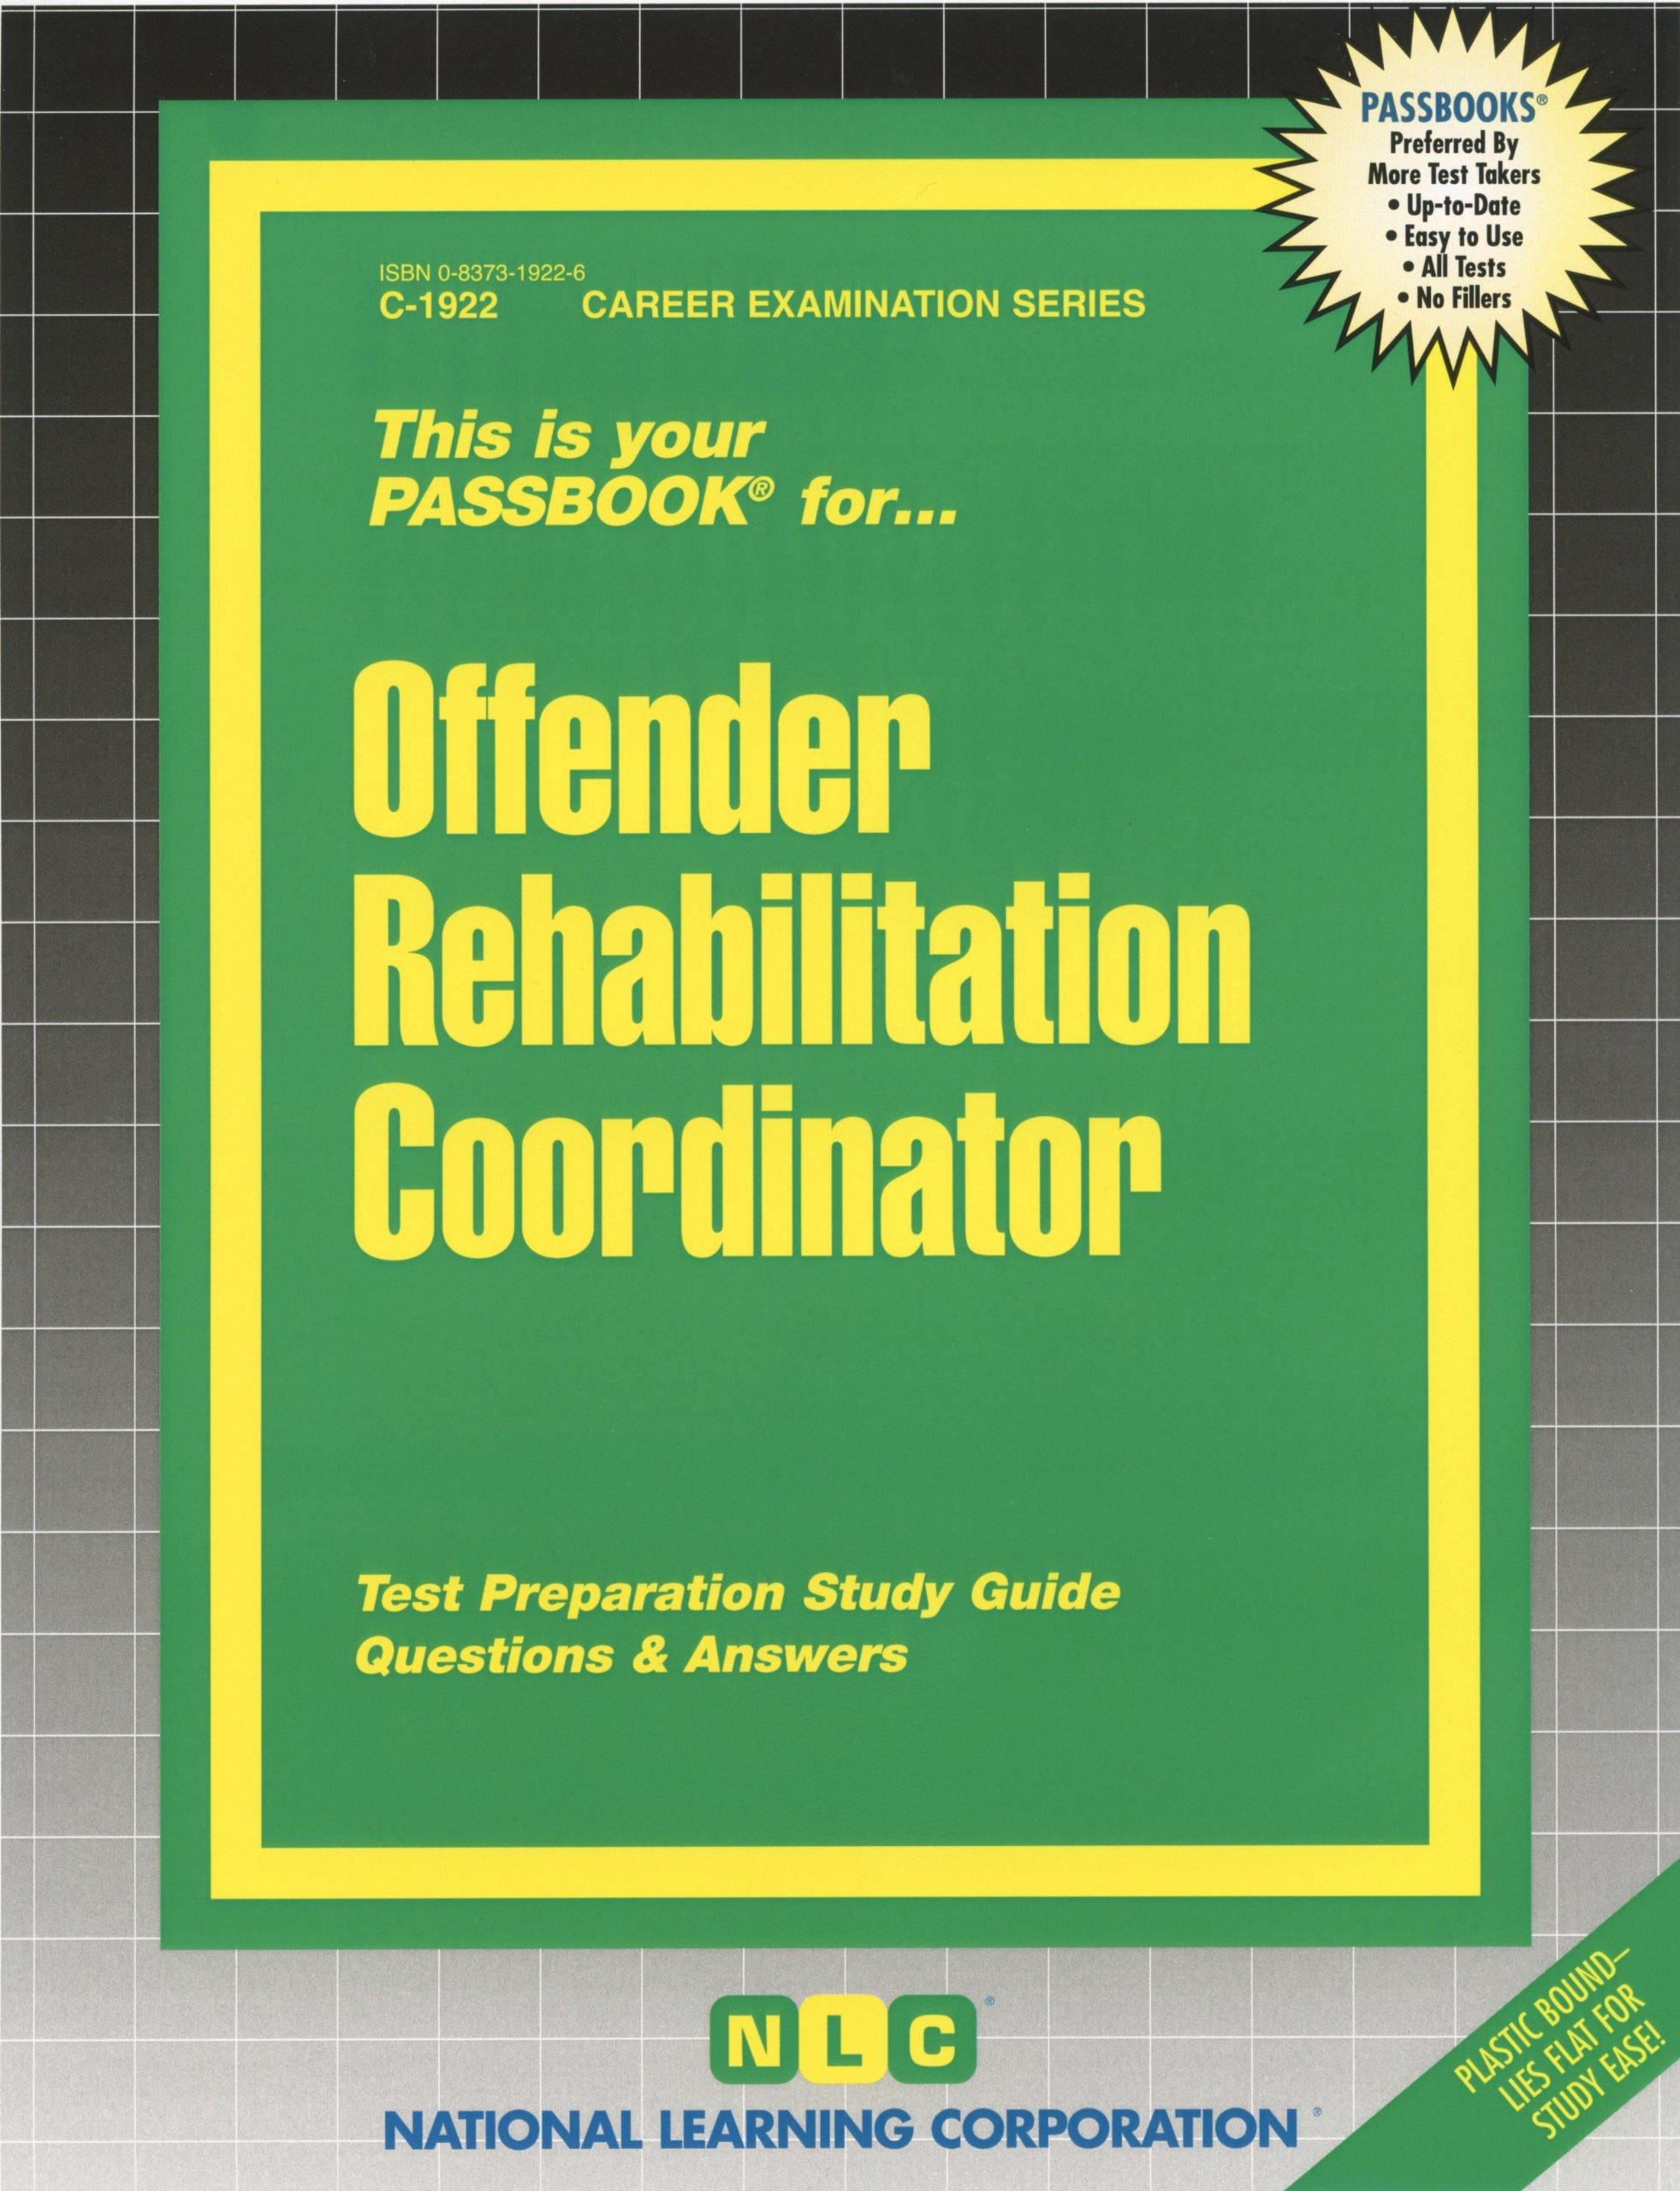 Offender Rehabilitation Coordinator(Passbooks): Passbooks: 9780829319224:  Amazon.com: Books